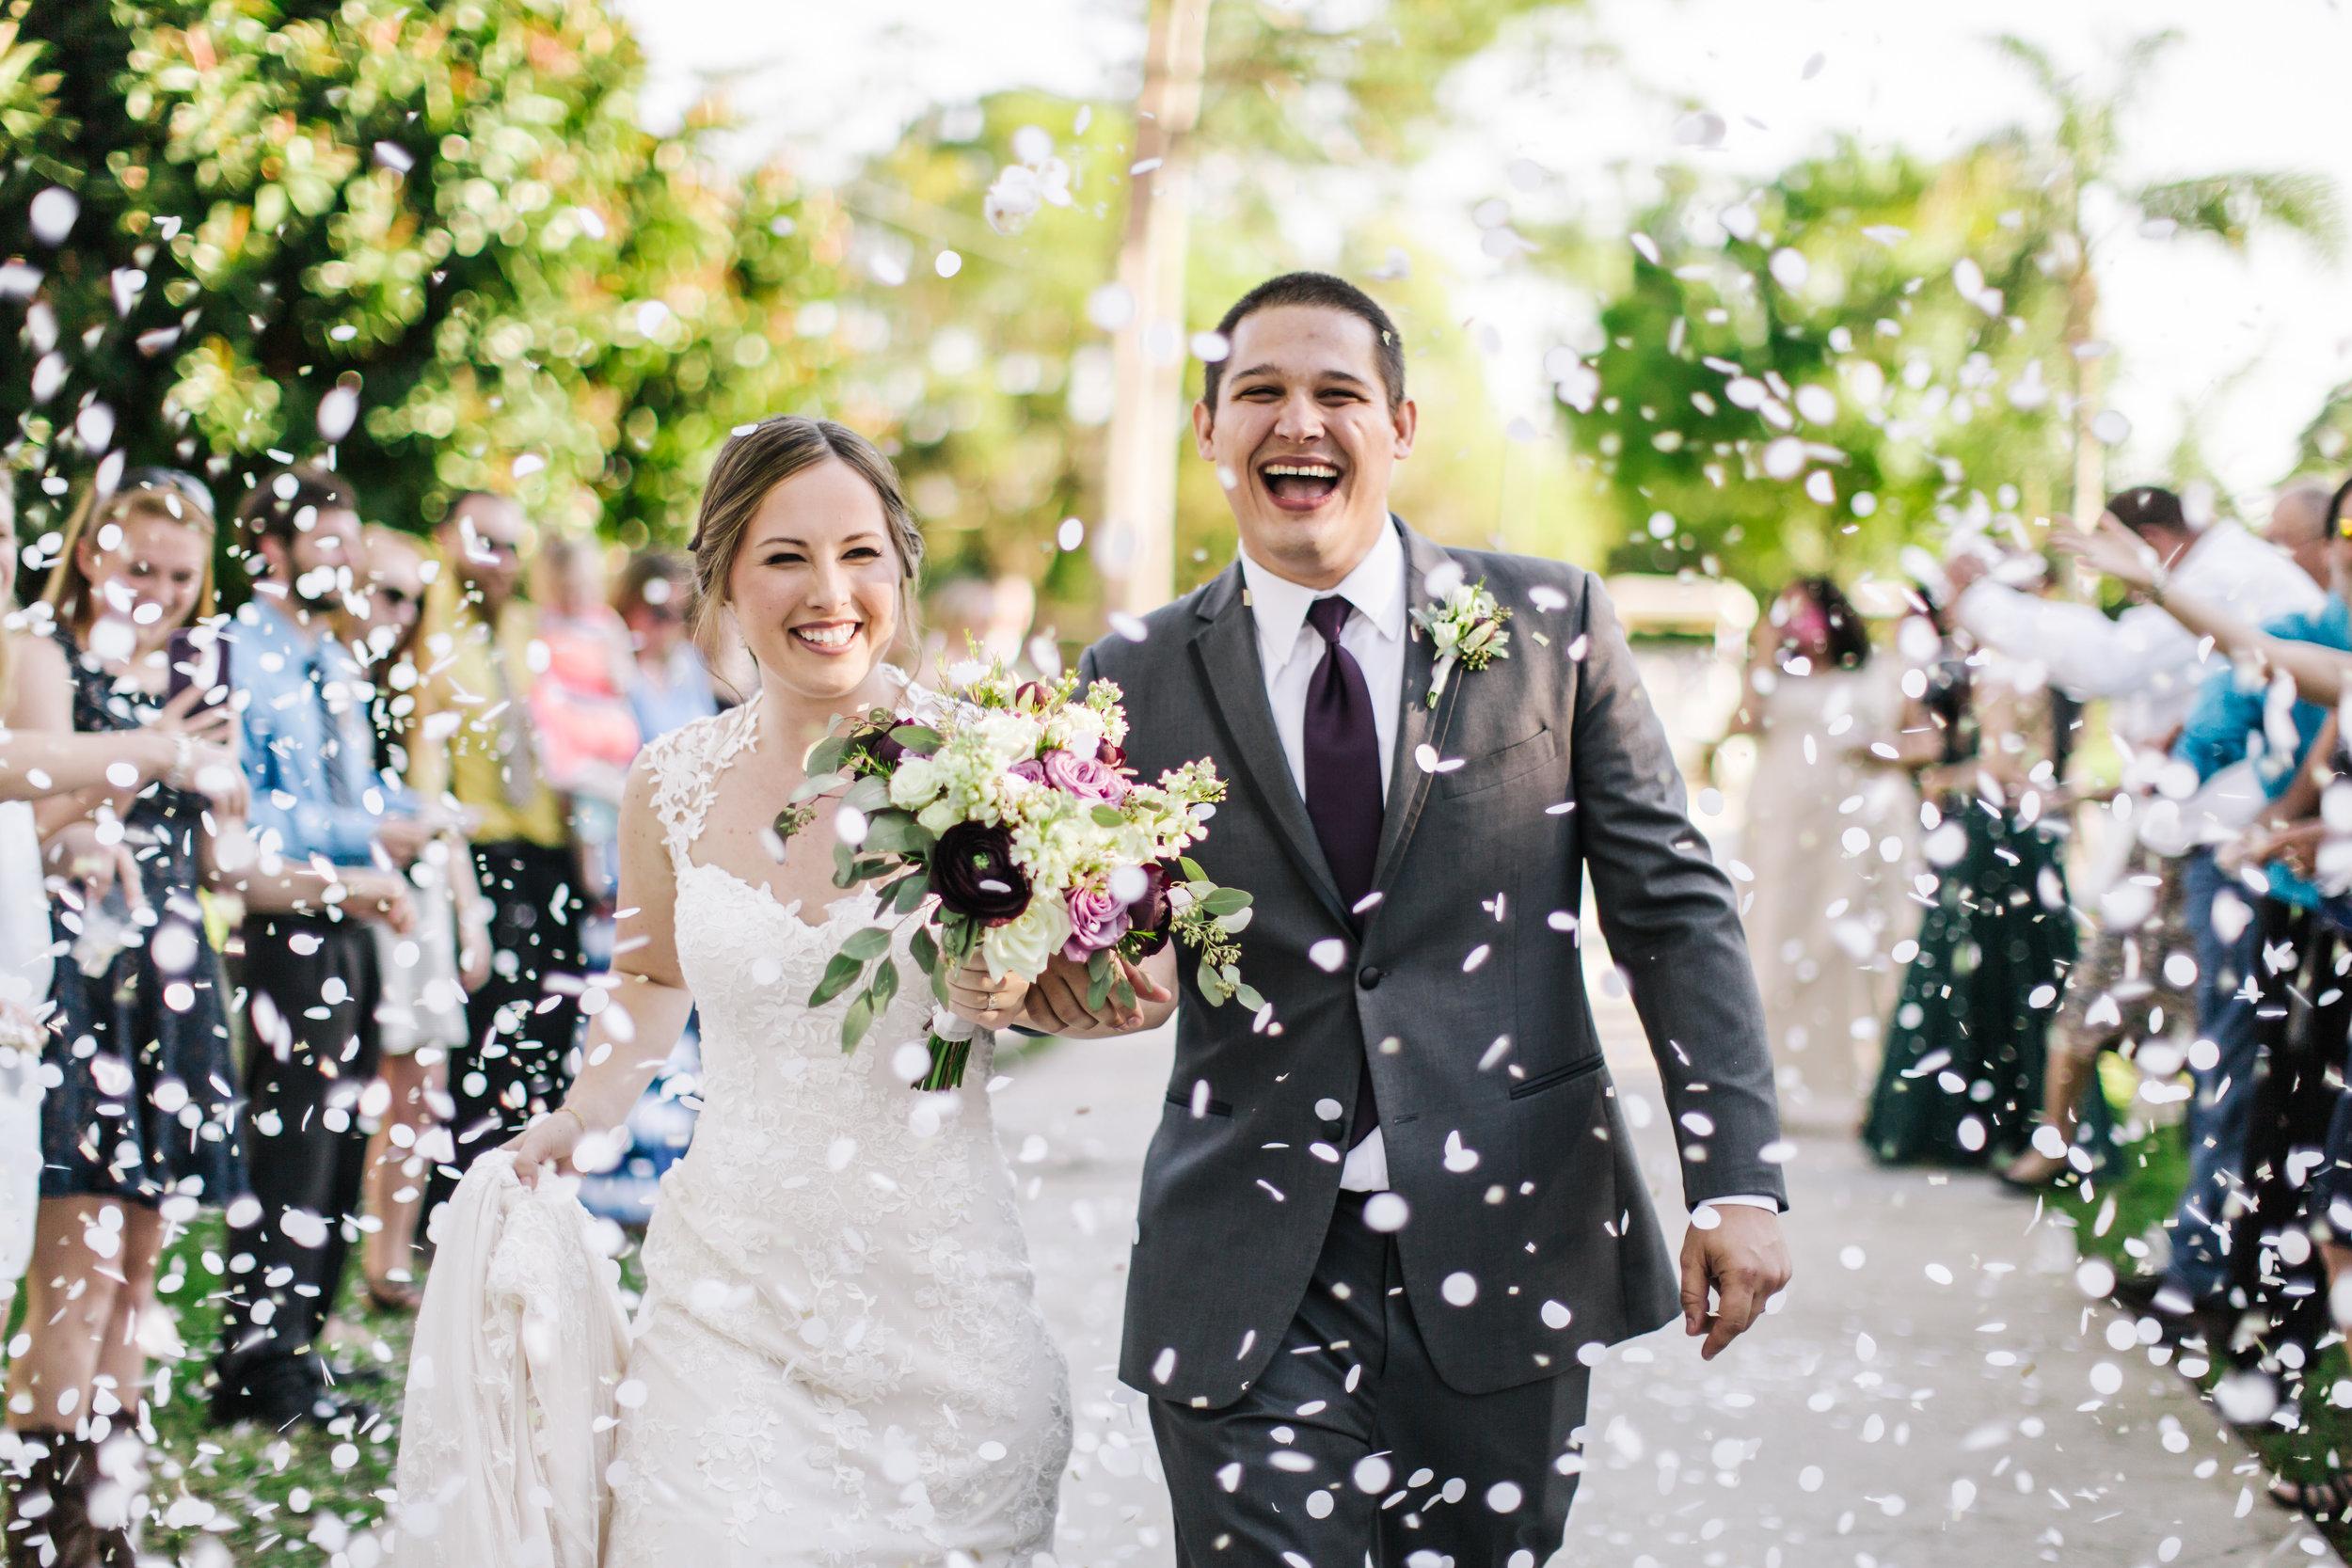 2018.02.17 Whitney and Joe Meyer Melbourne Wedding (339 of 759).jpg